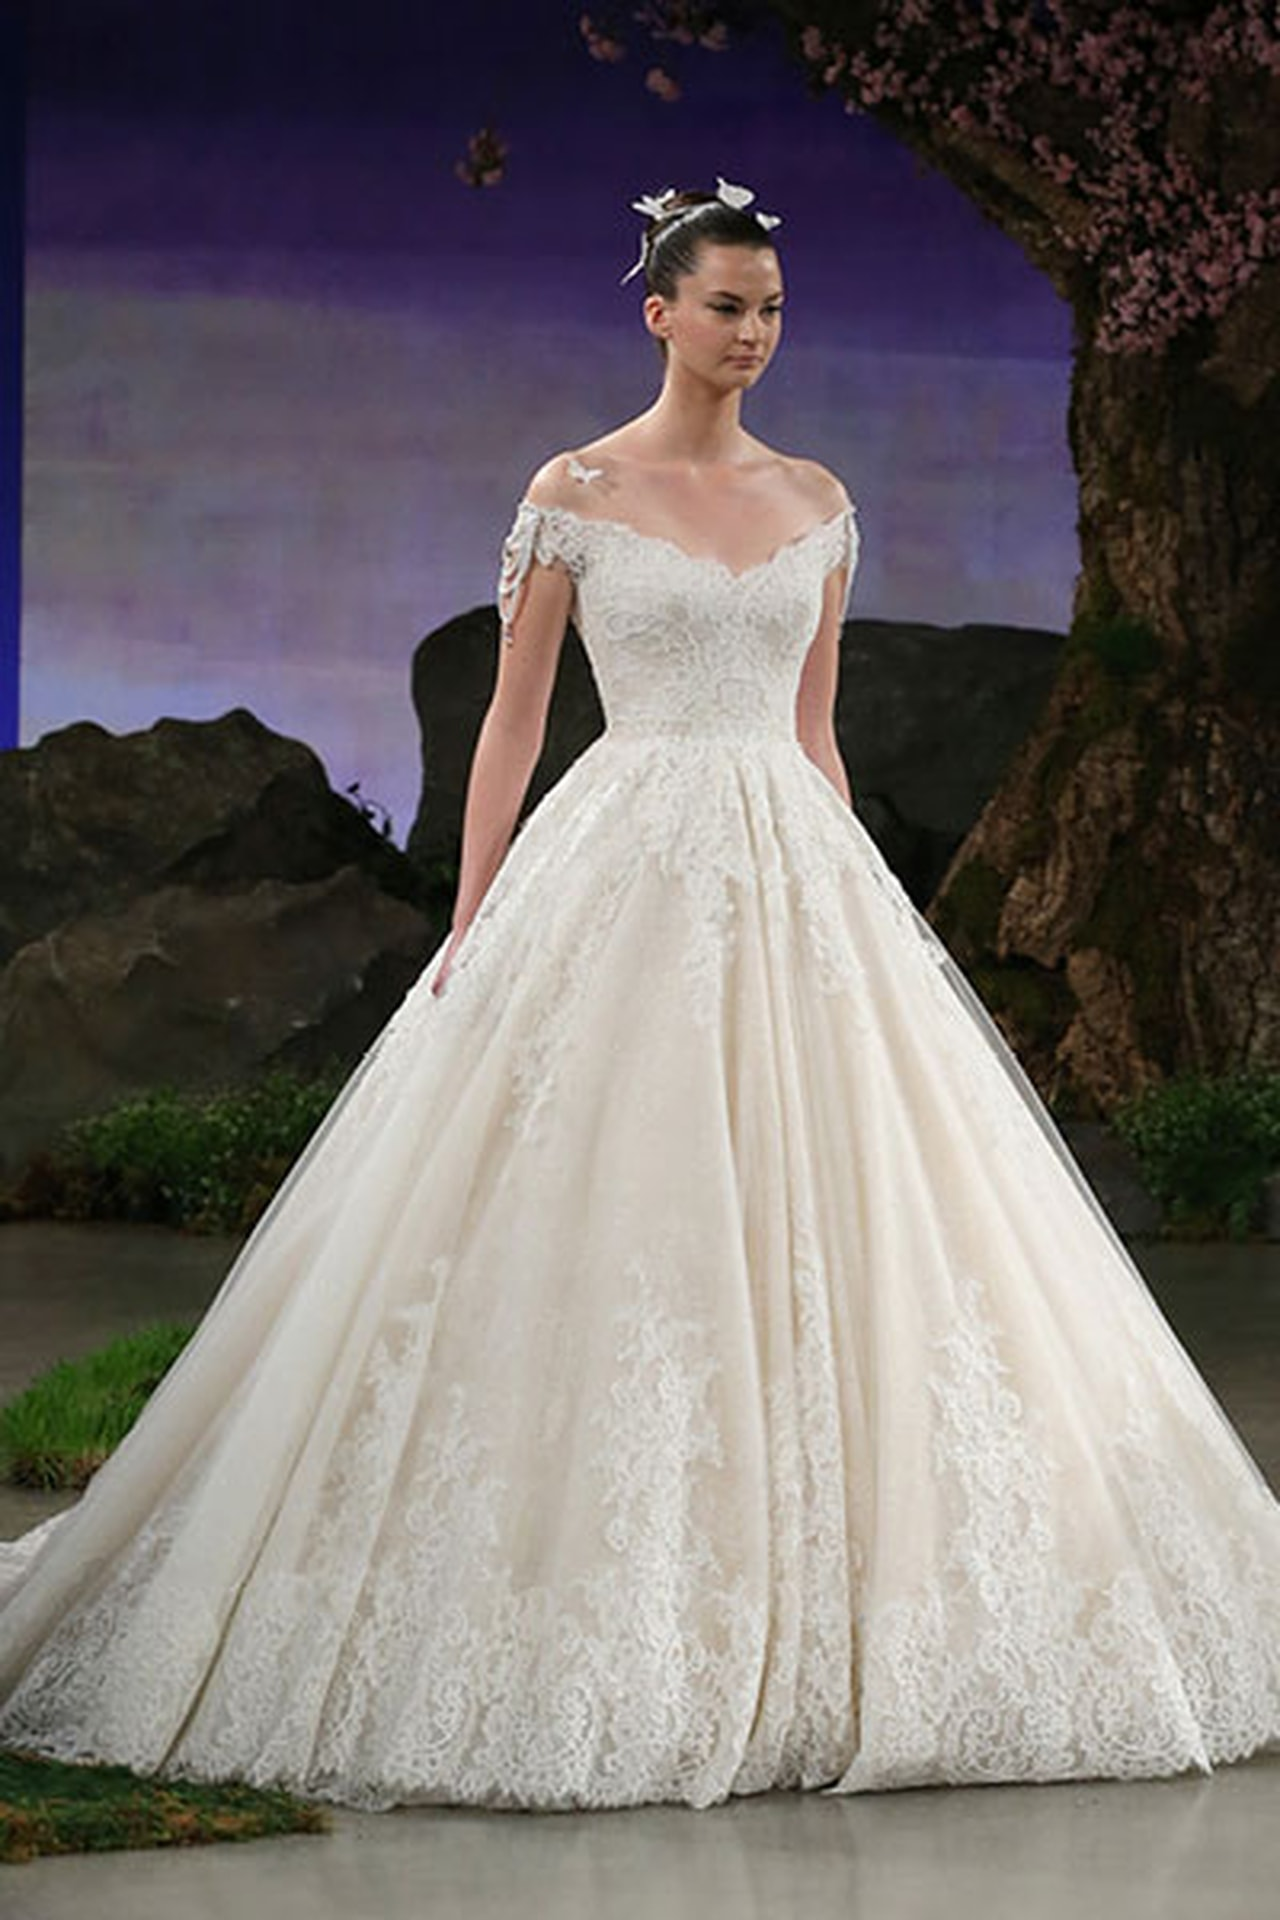 6df3d96e3 تصميم فساتين زفاف , فساتين افراح خيالية - افضل جديد